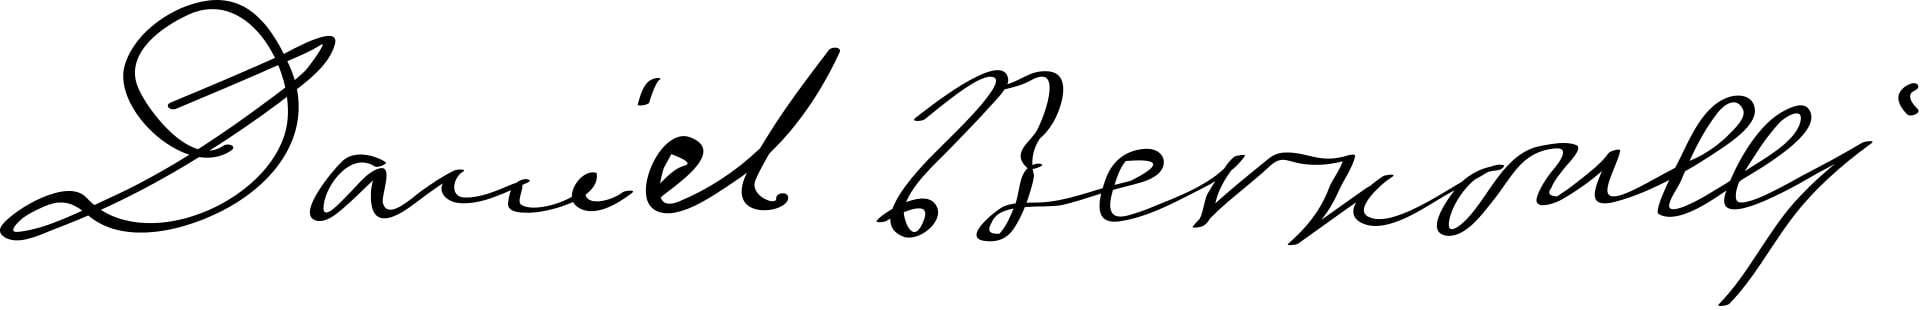 Daniel Bernoulli Signature